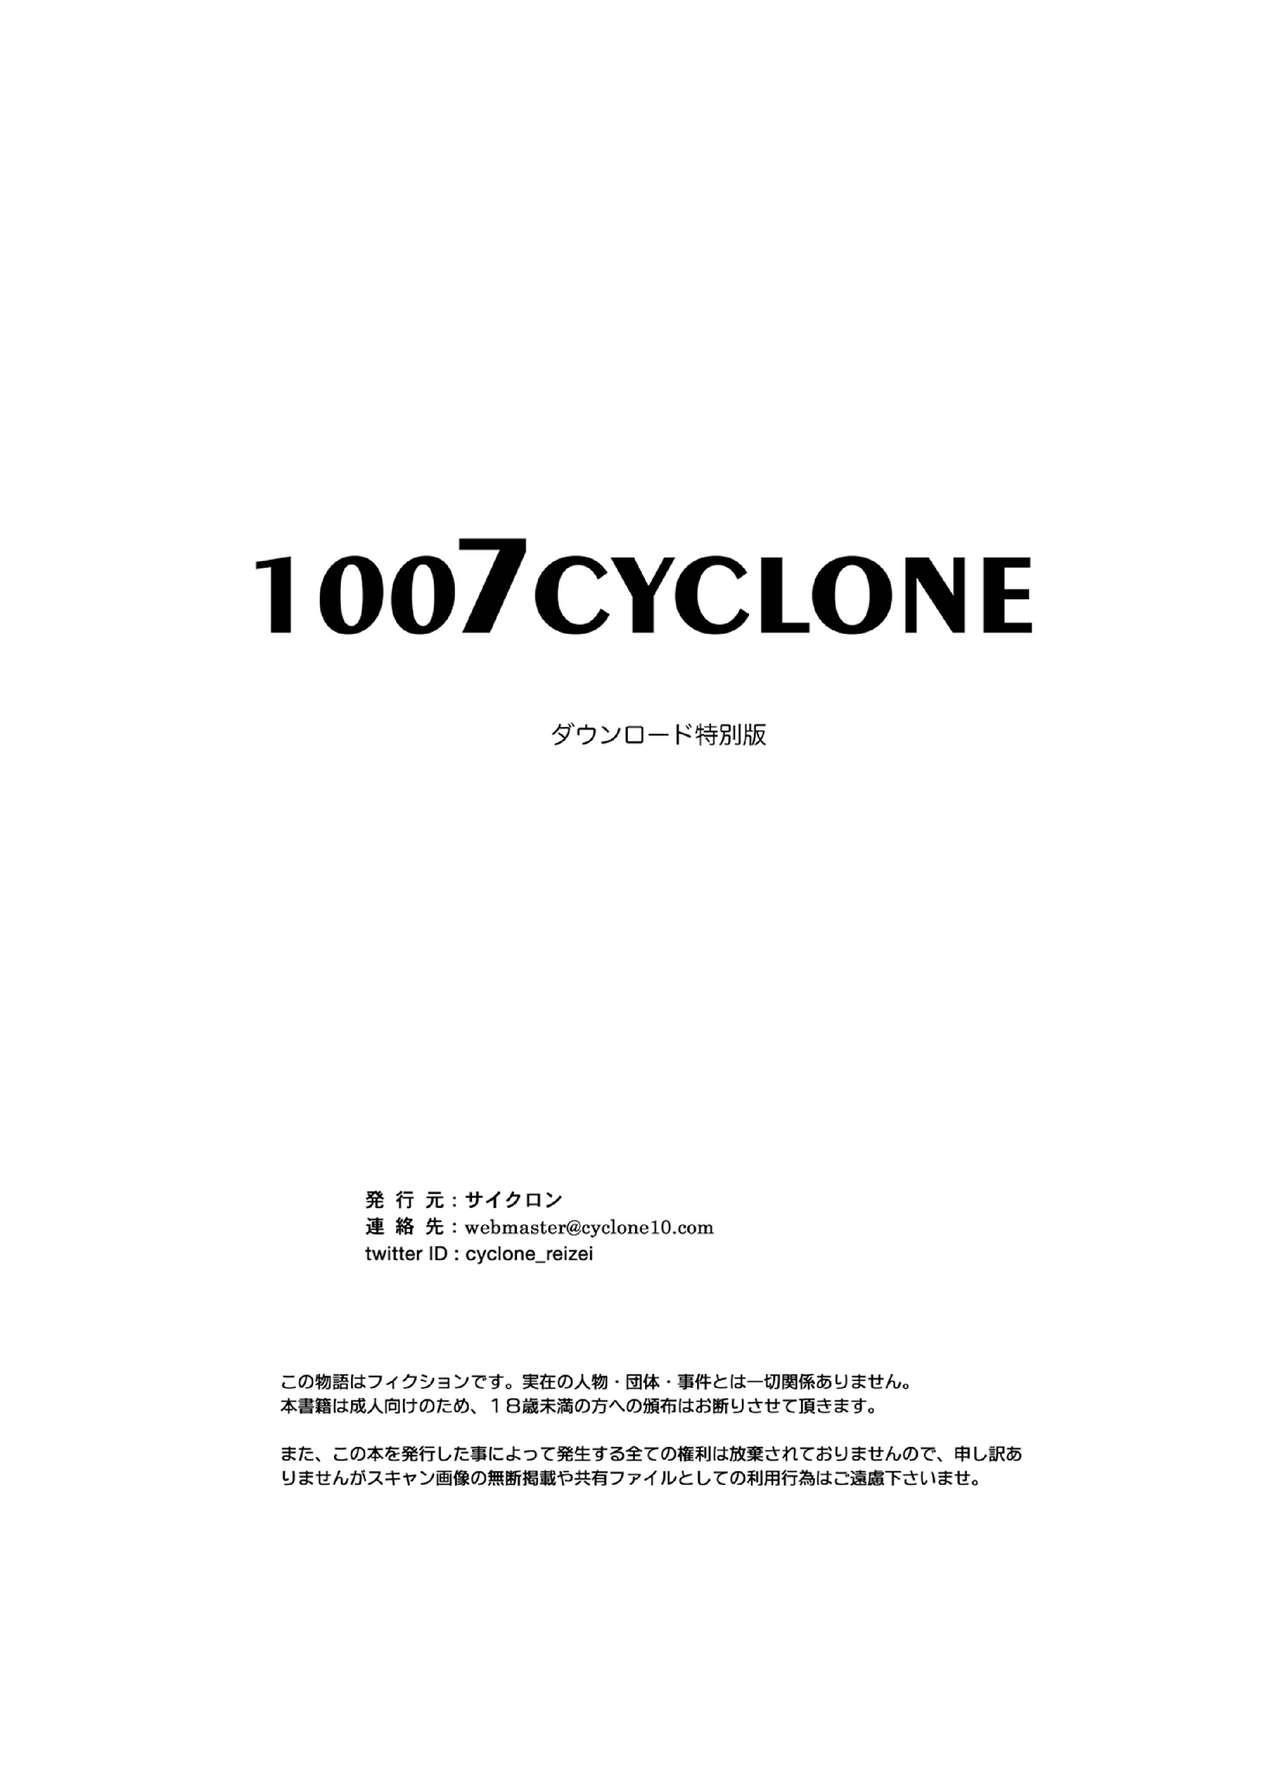 1007CYCLONE 186